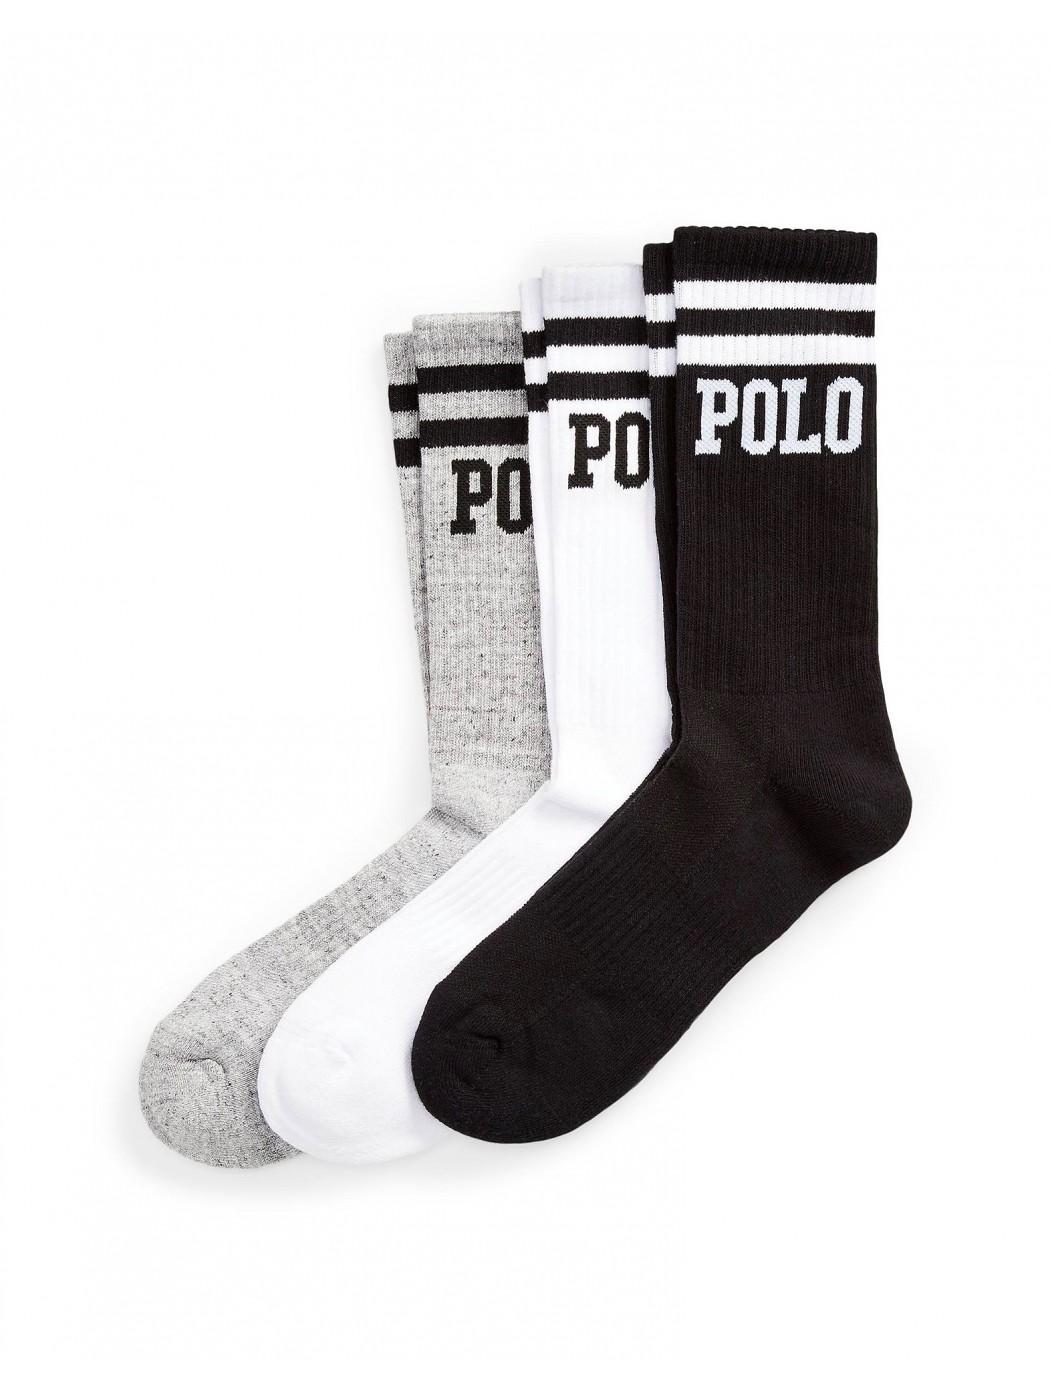 LOGO CREW SOCK 3-PACK POLO RALPH LAUREN UOMO 449799768 001